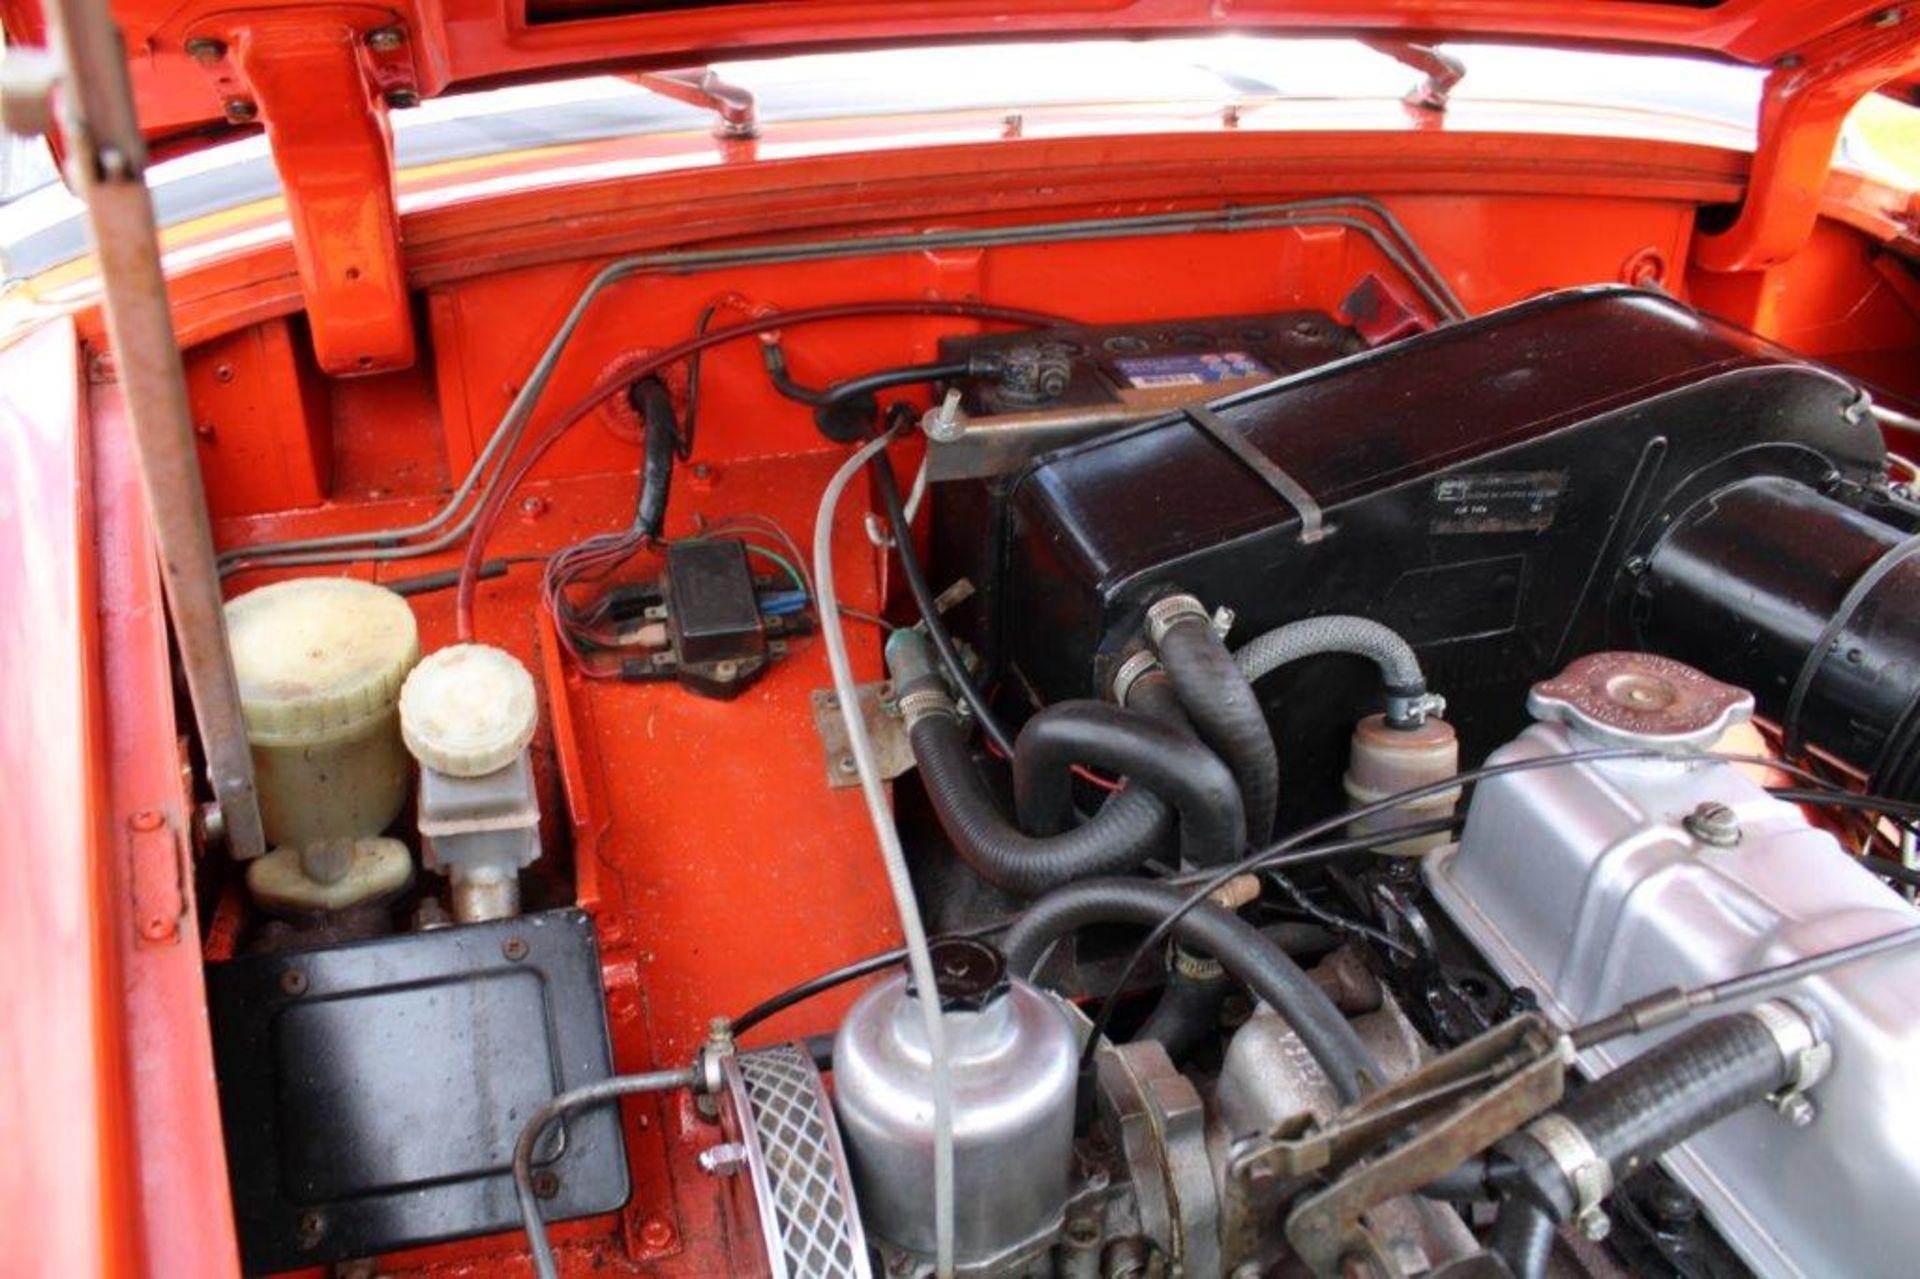 1979 MG Midget 1500 - Image 25 of 37